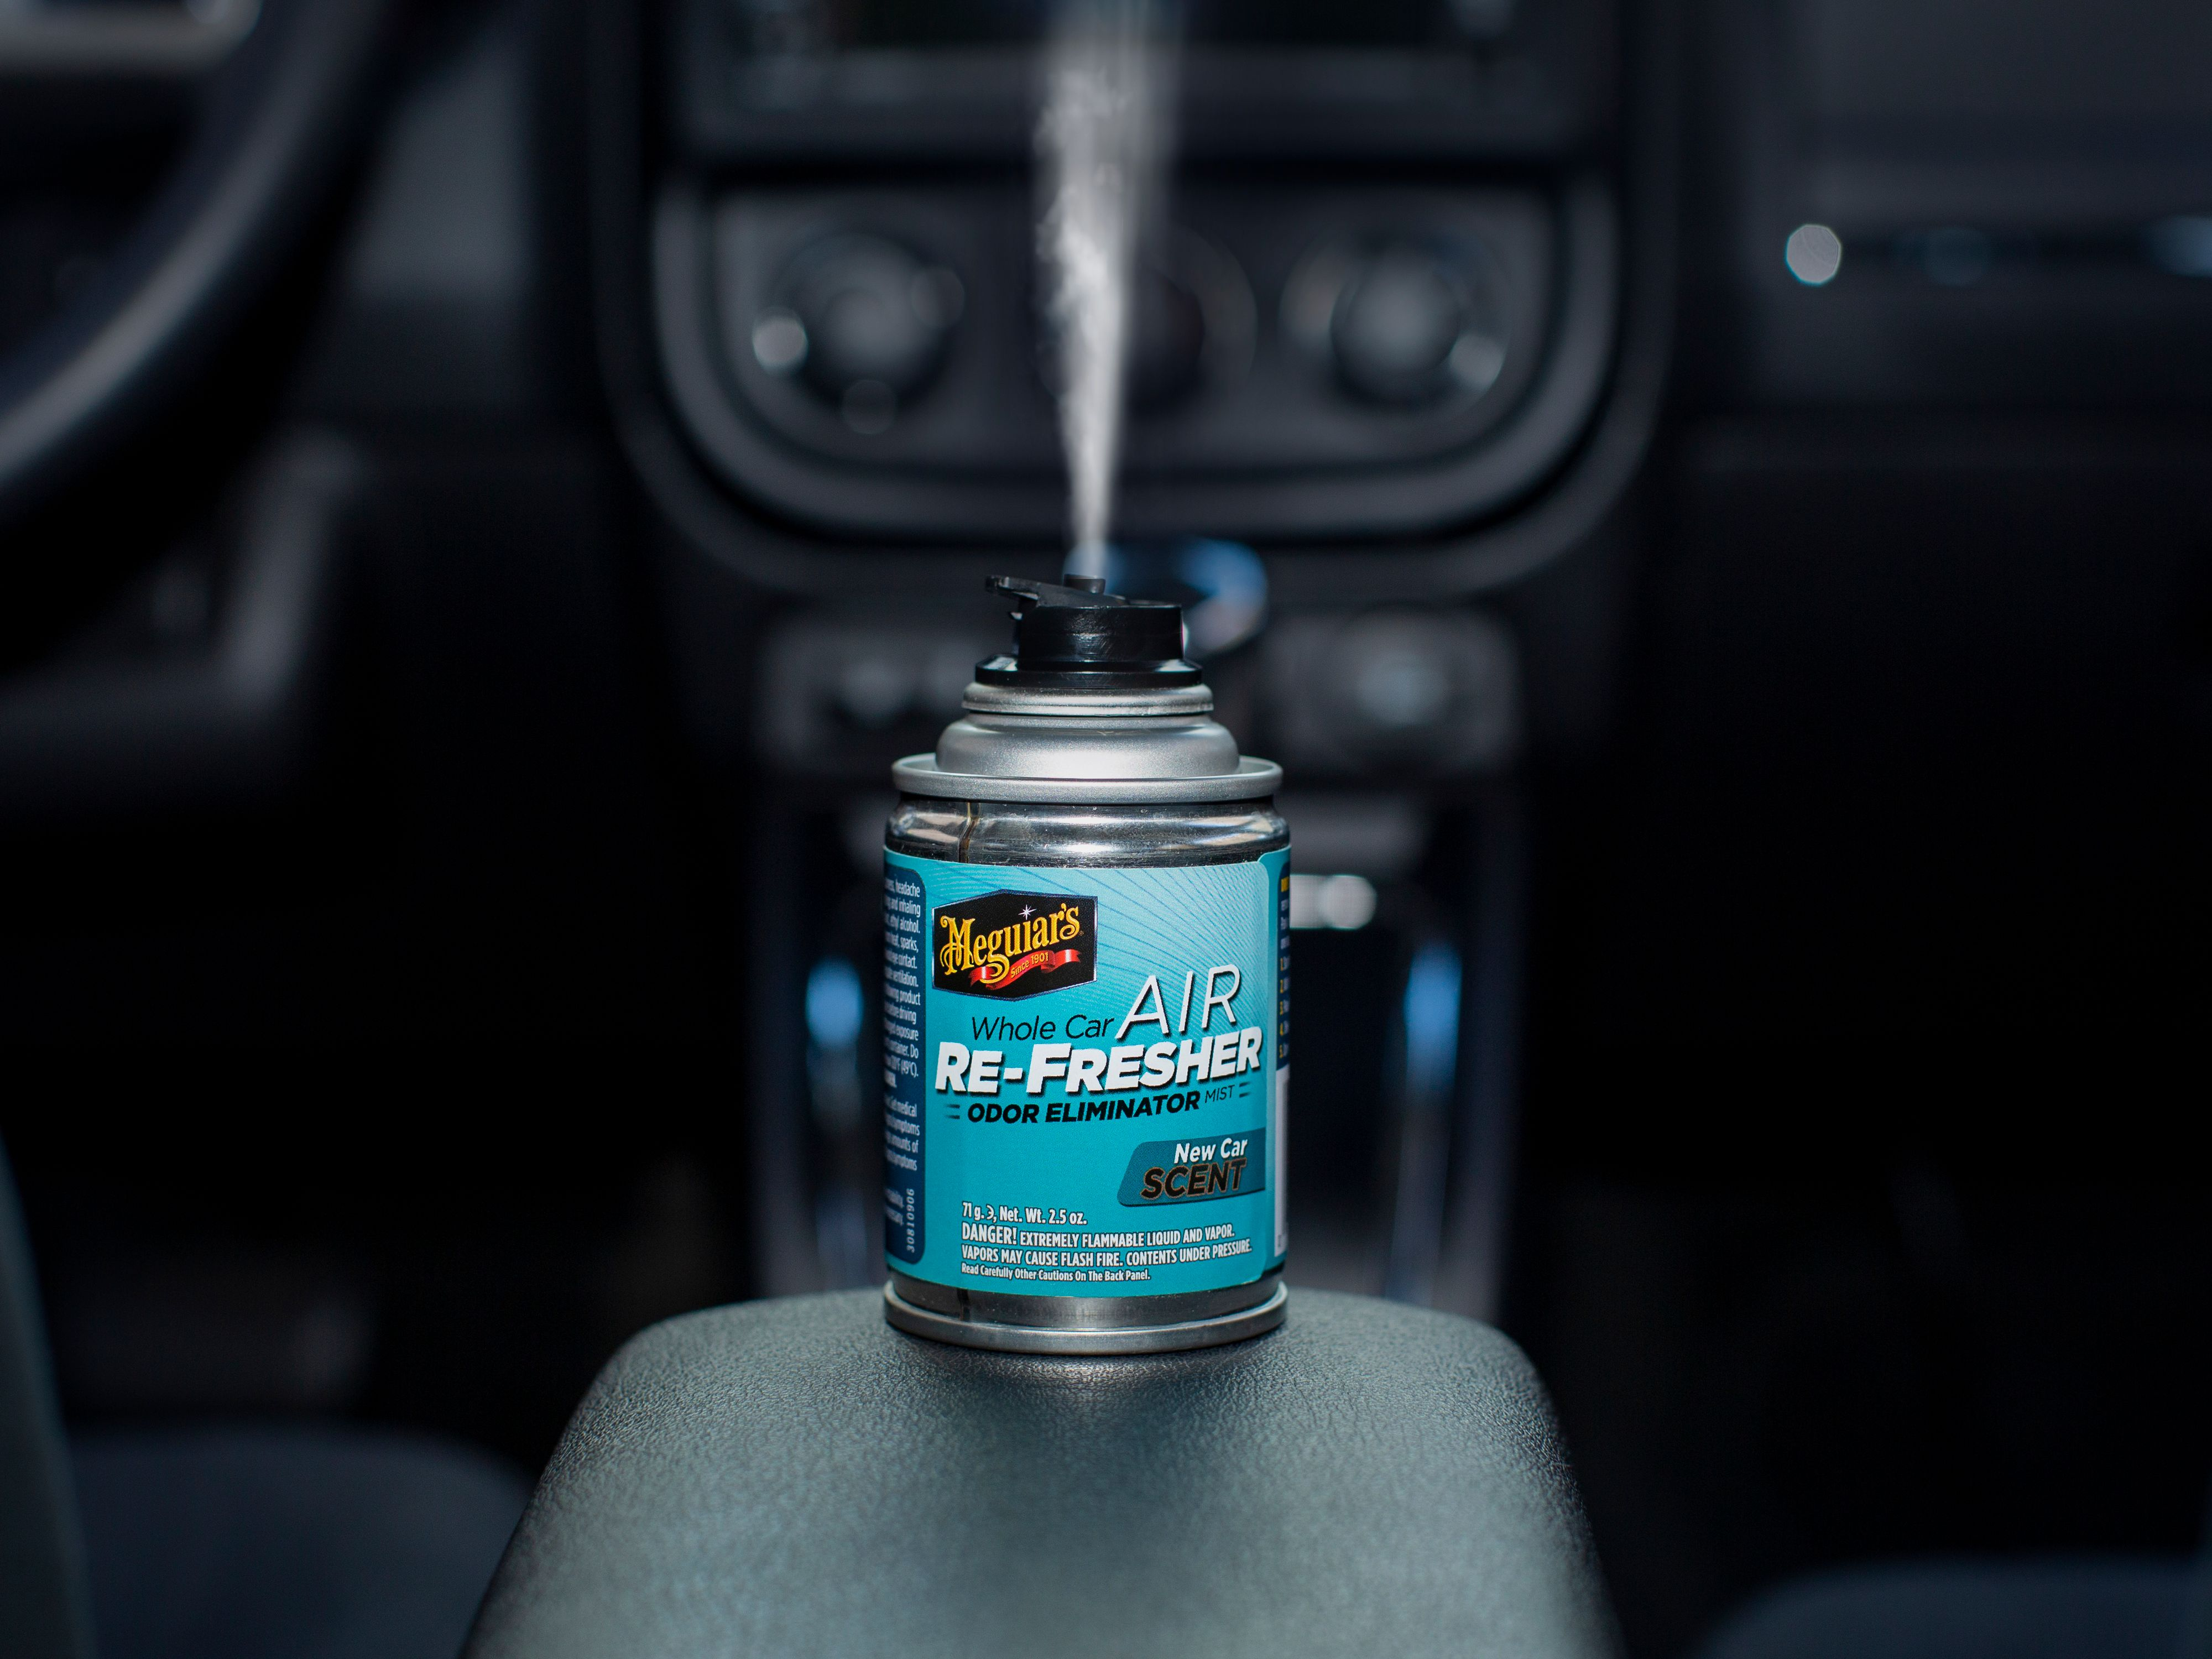 Car Odor Eliminator >> Meguiar S Whole Car Air Re Fresher Odor Eliminator Mist